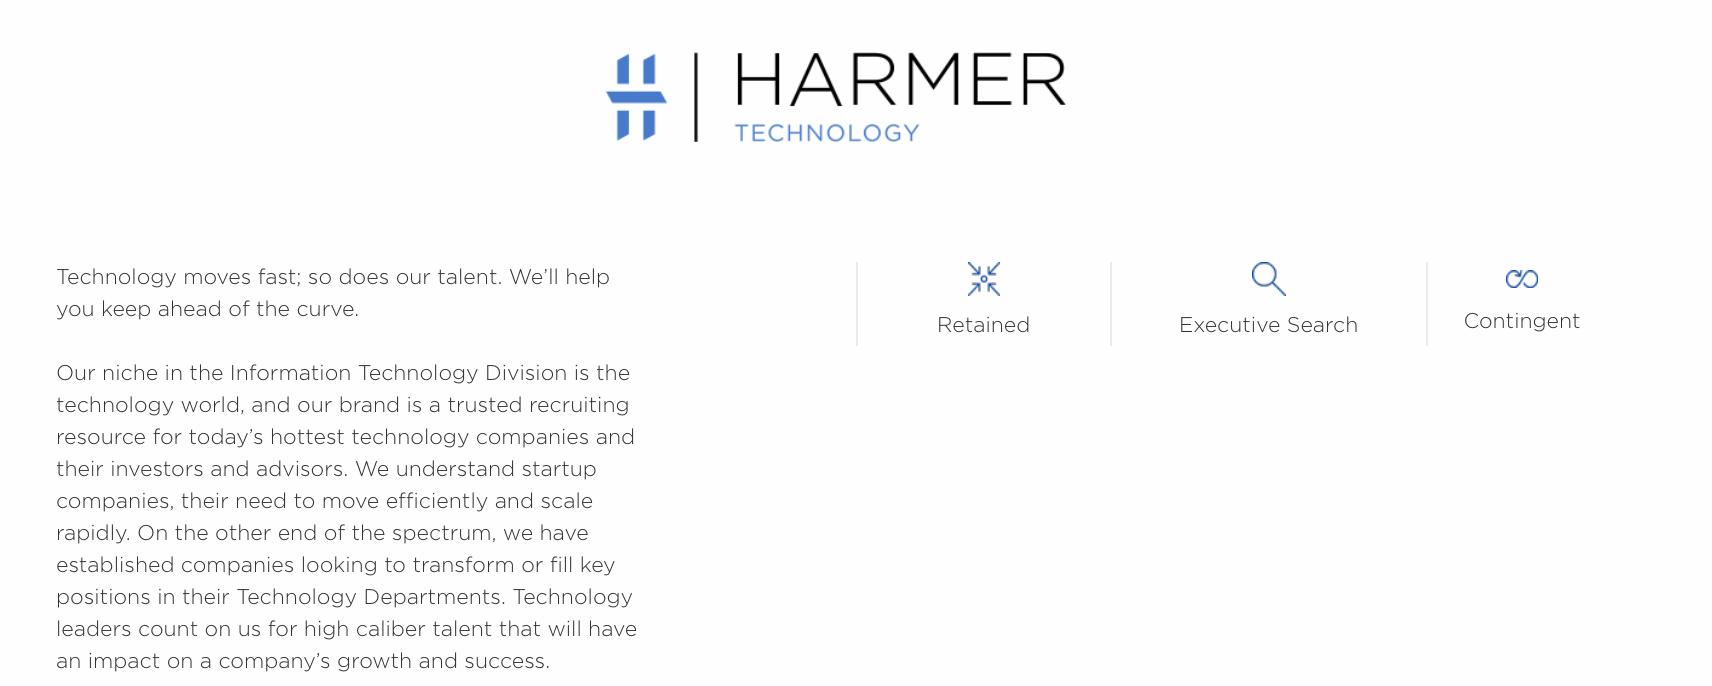 Harmer website image